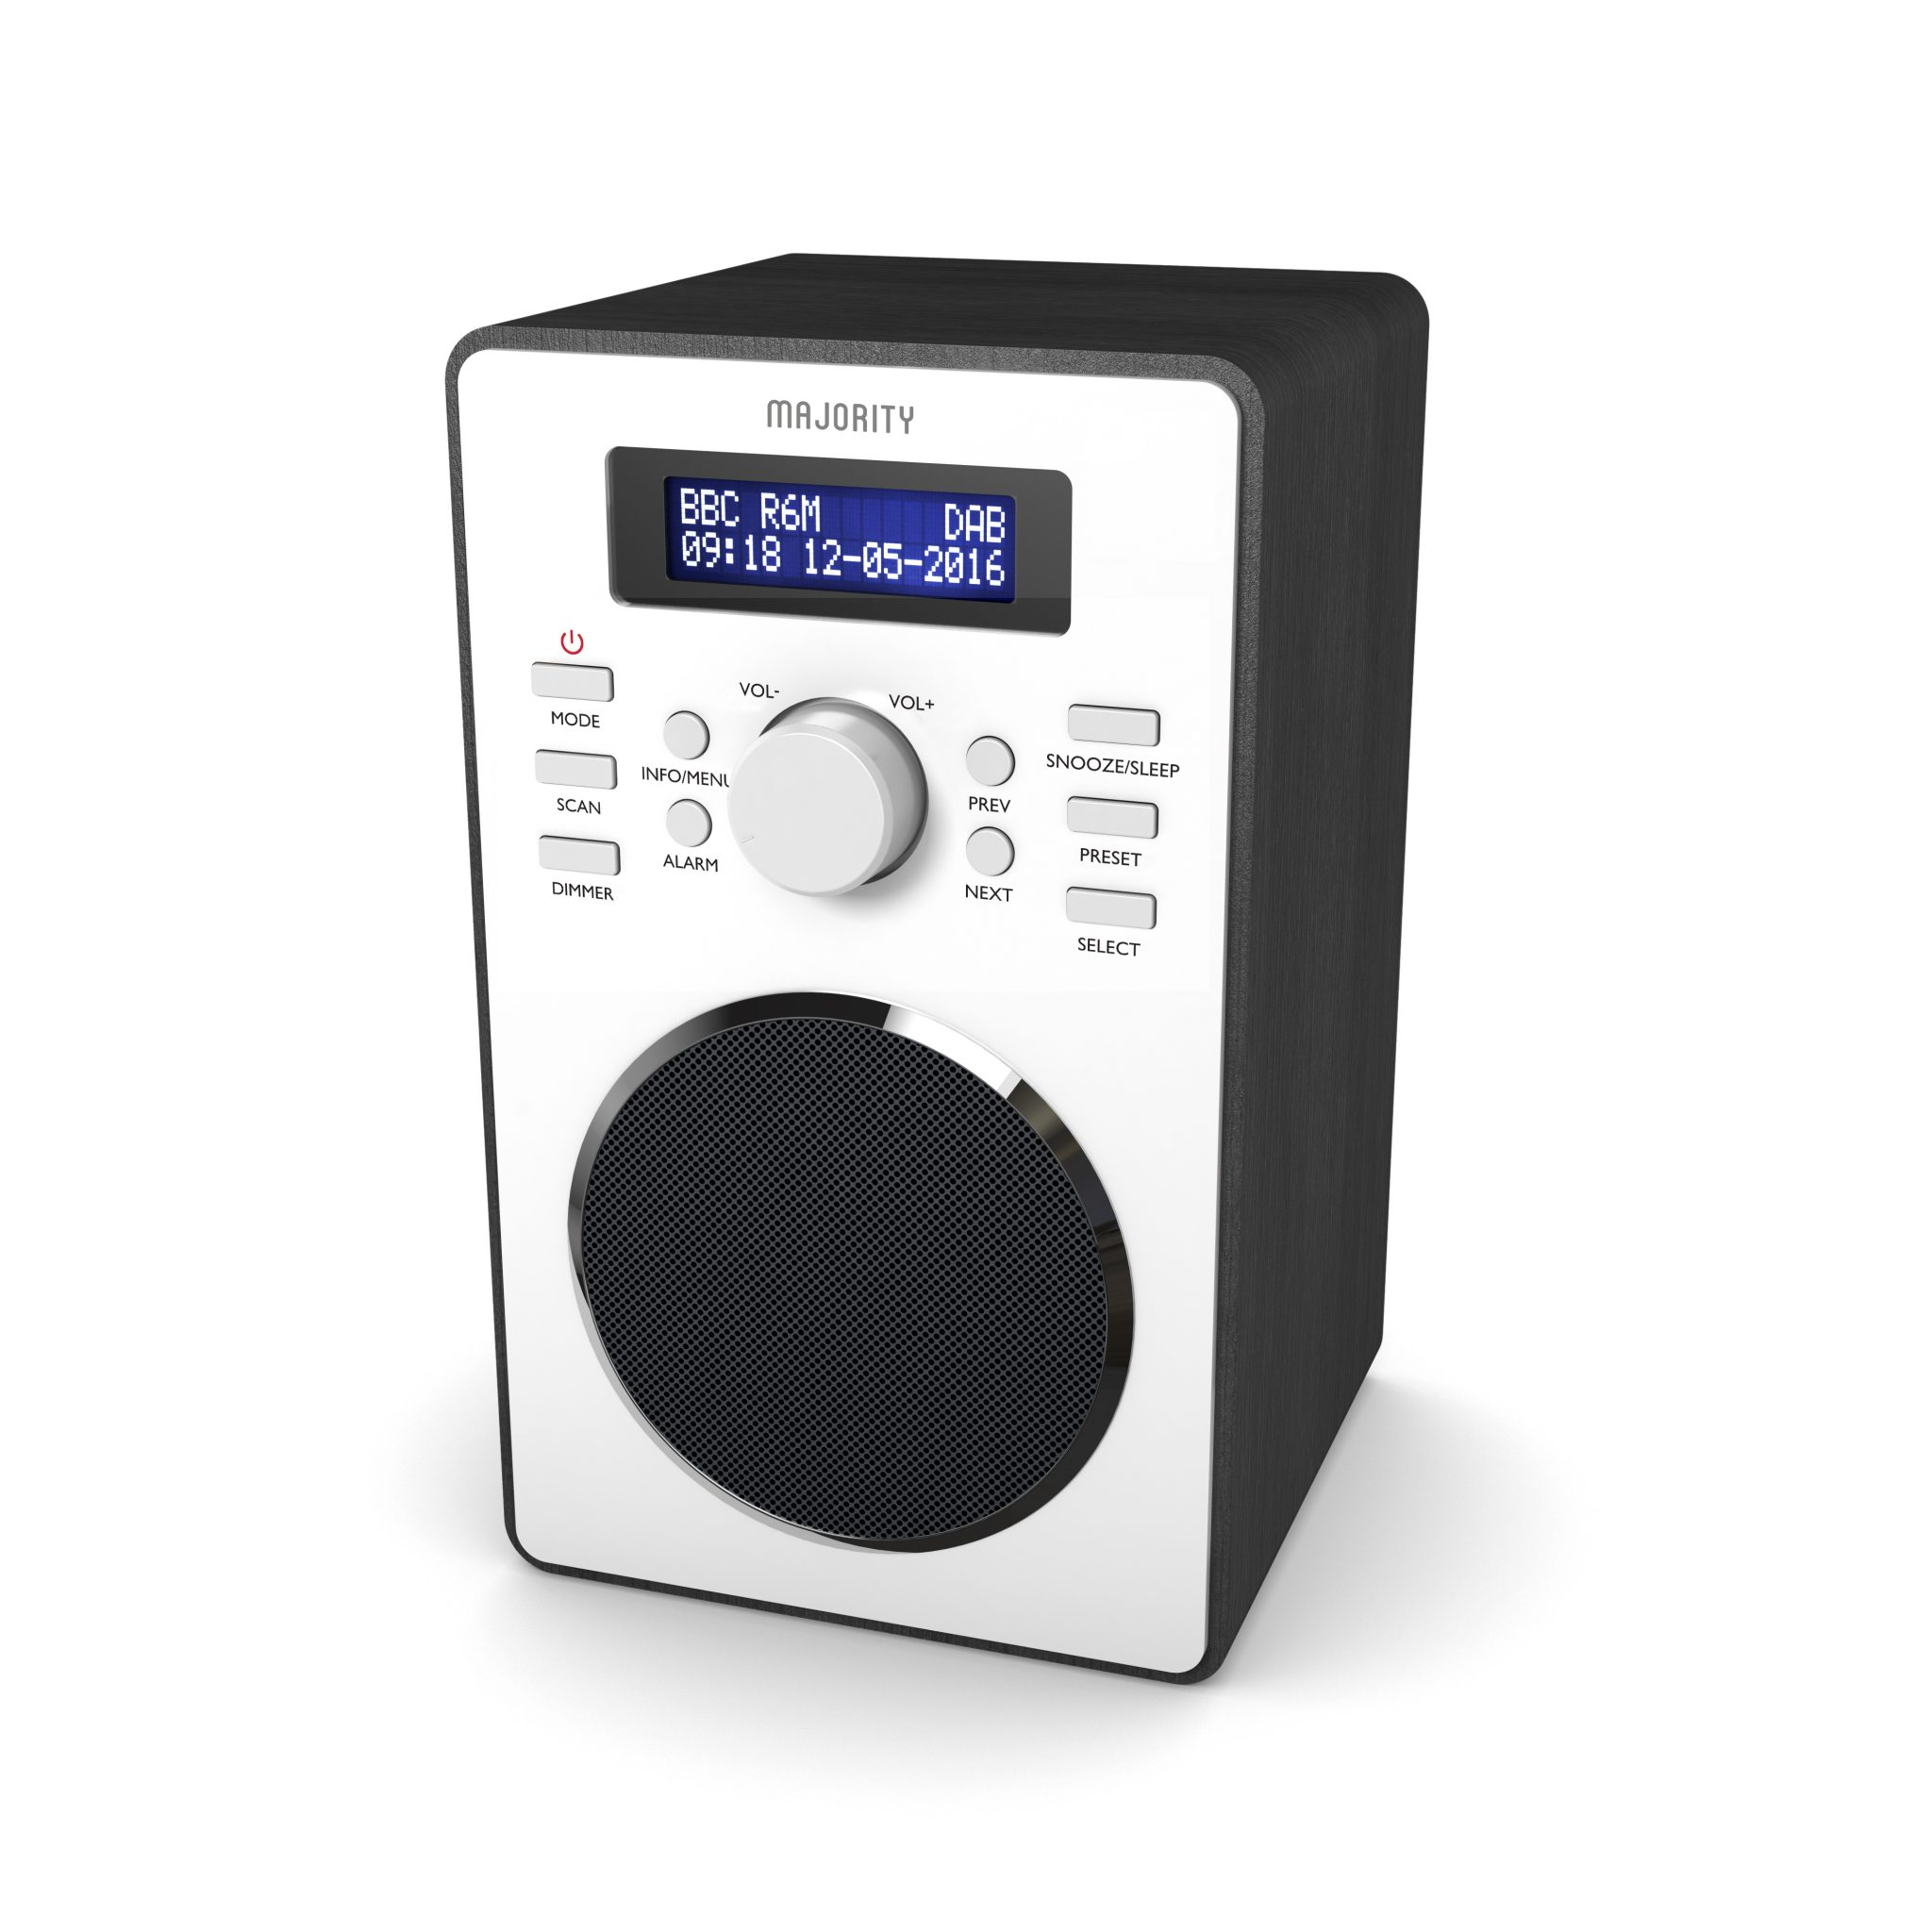 DAB Digital Radio - Barton Black Angled